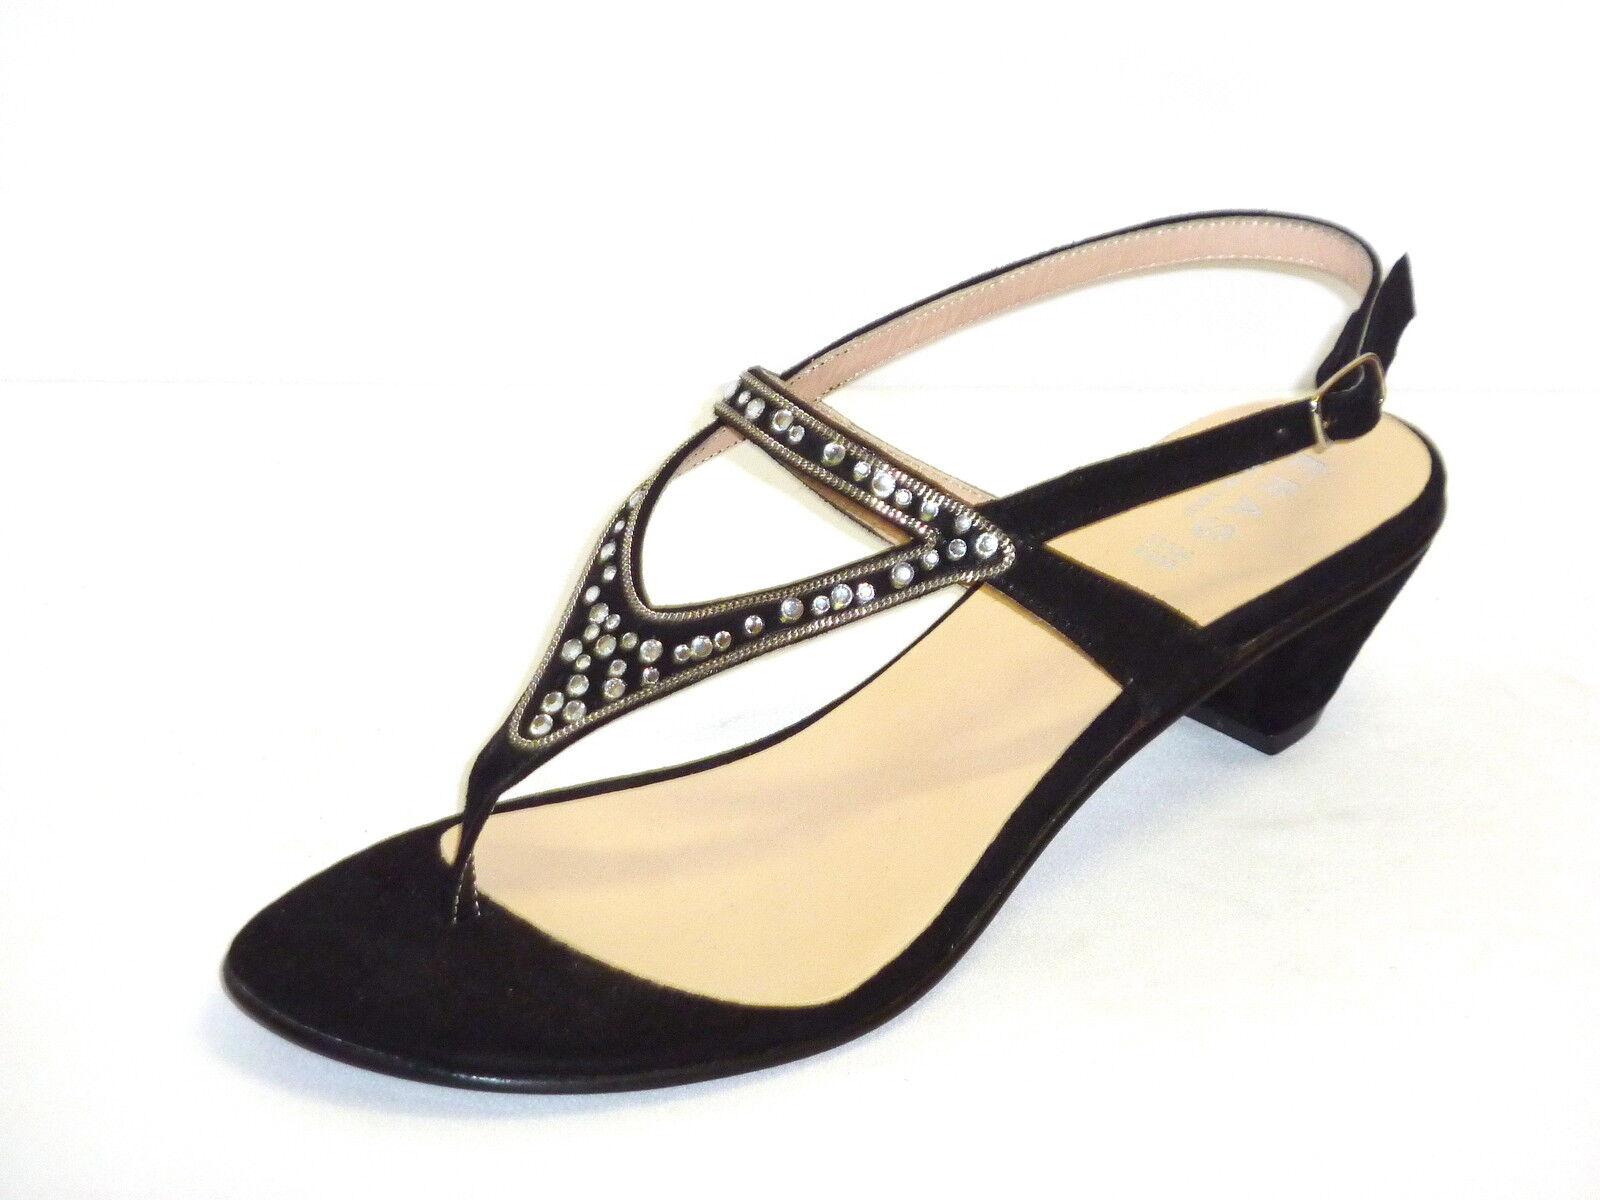 687 SANDALI INFRADITO femmes NUOVI ARRIVI ESTATE chaussures TACCO BASSO PELLE noir 35